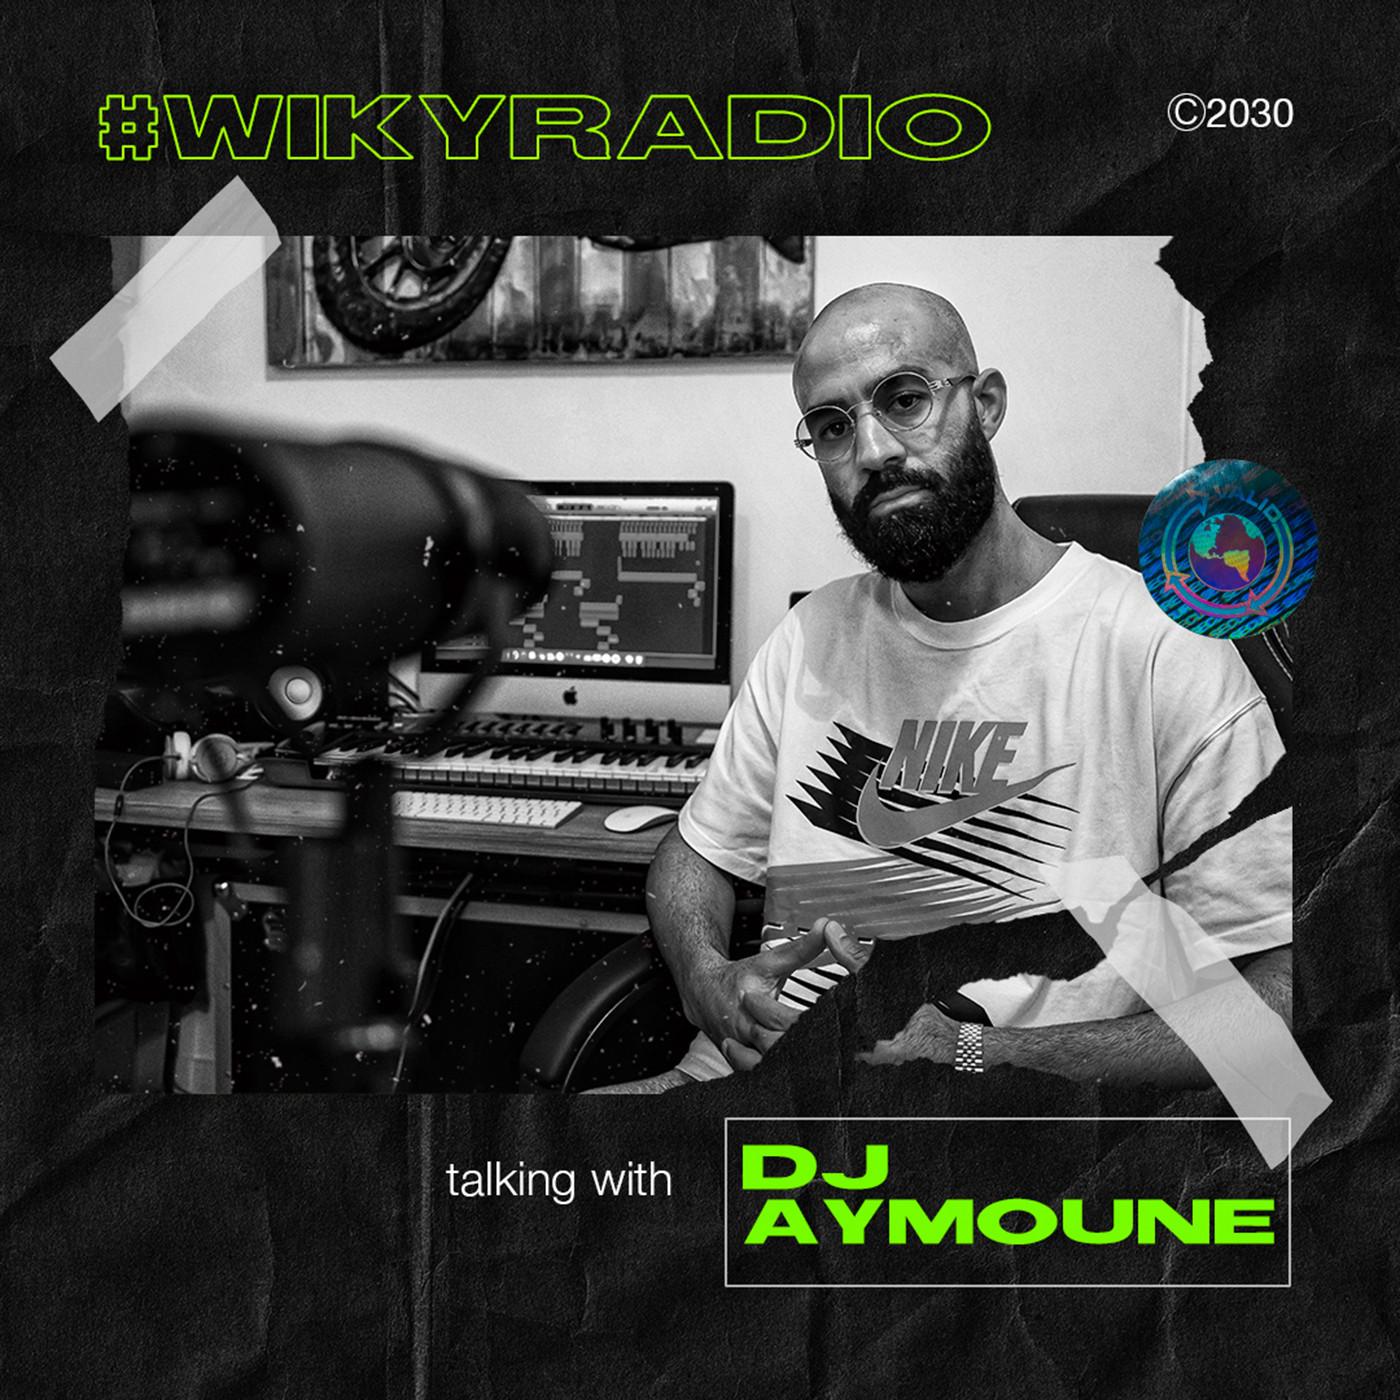 WIKY RADIO - TALKING WITH DJ AYMOUNE